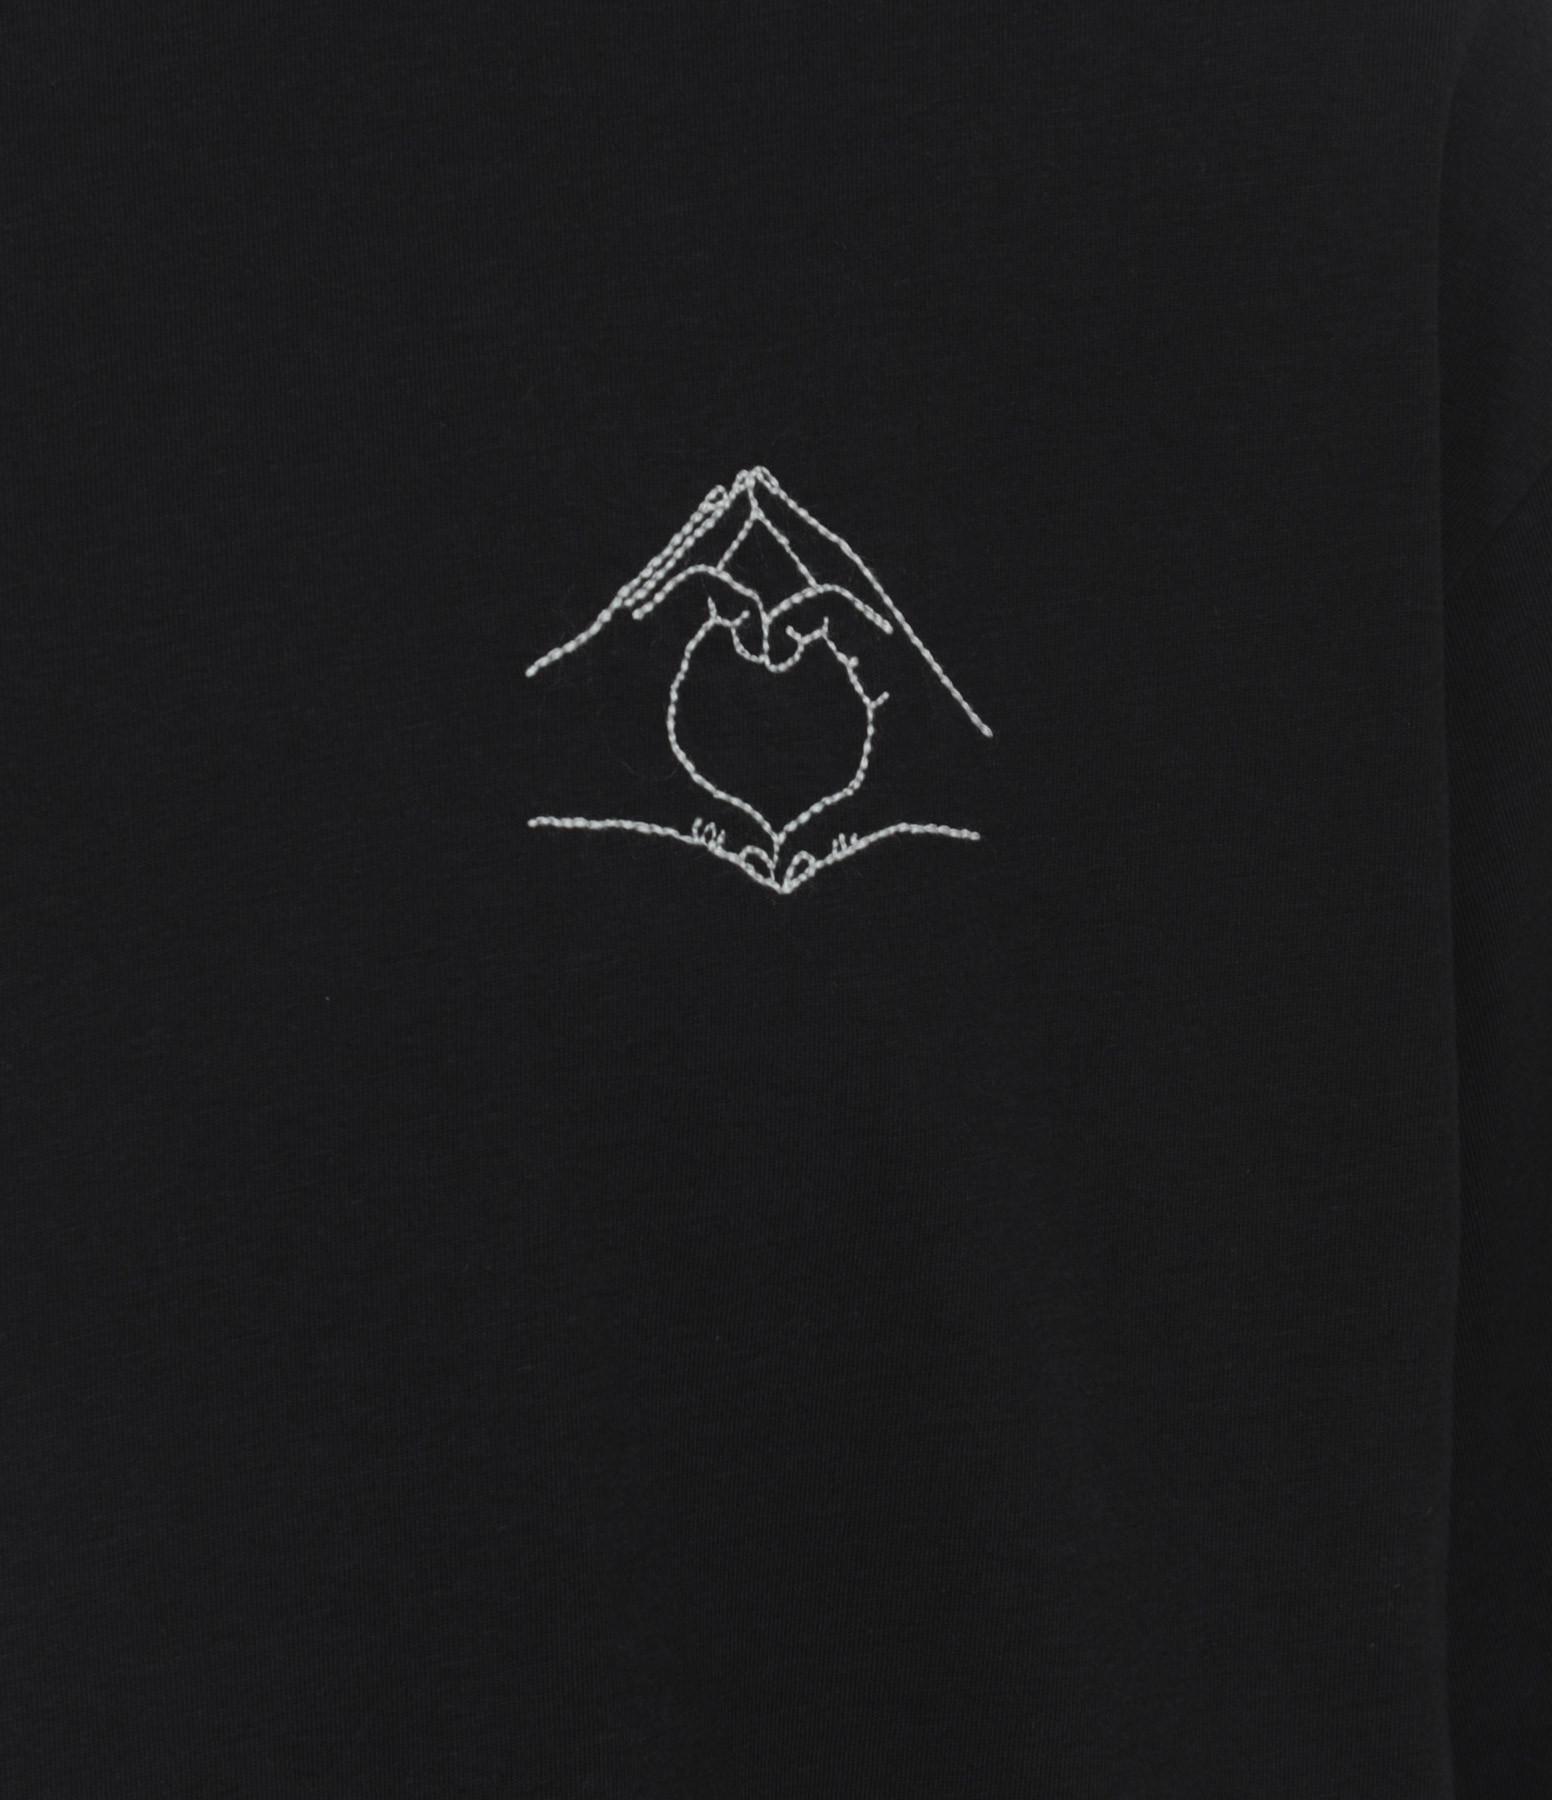 MAISON LABICHE - Tee-shirt Hand Love Coton Noir